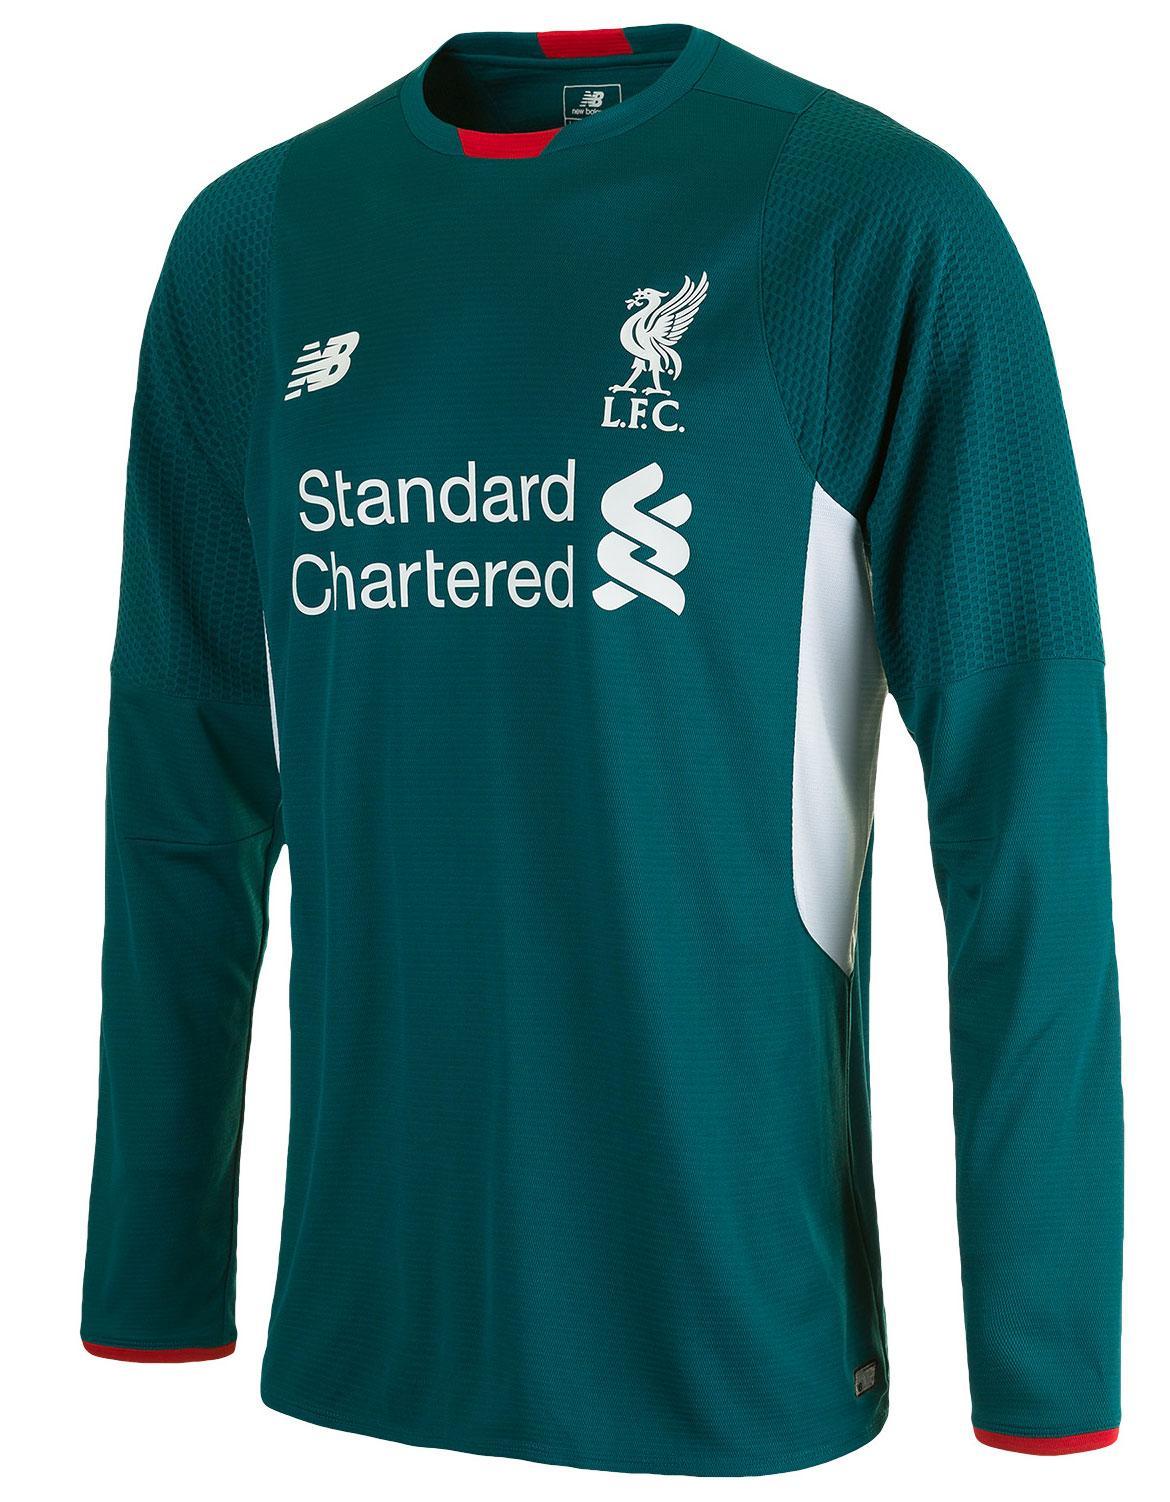 3b27b0d3bef Liverpool Målvaktströja 2015/16 Grön Barn